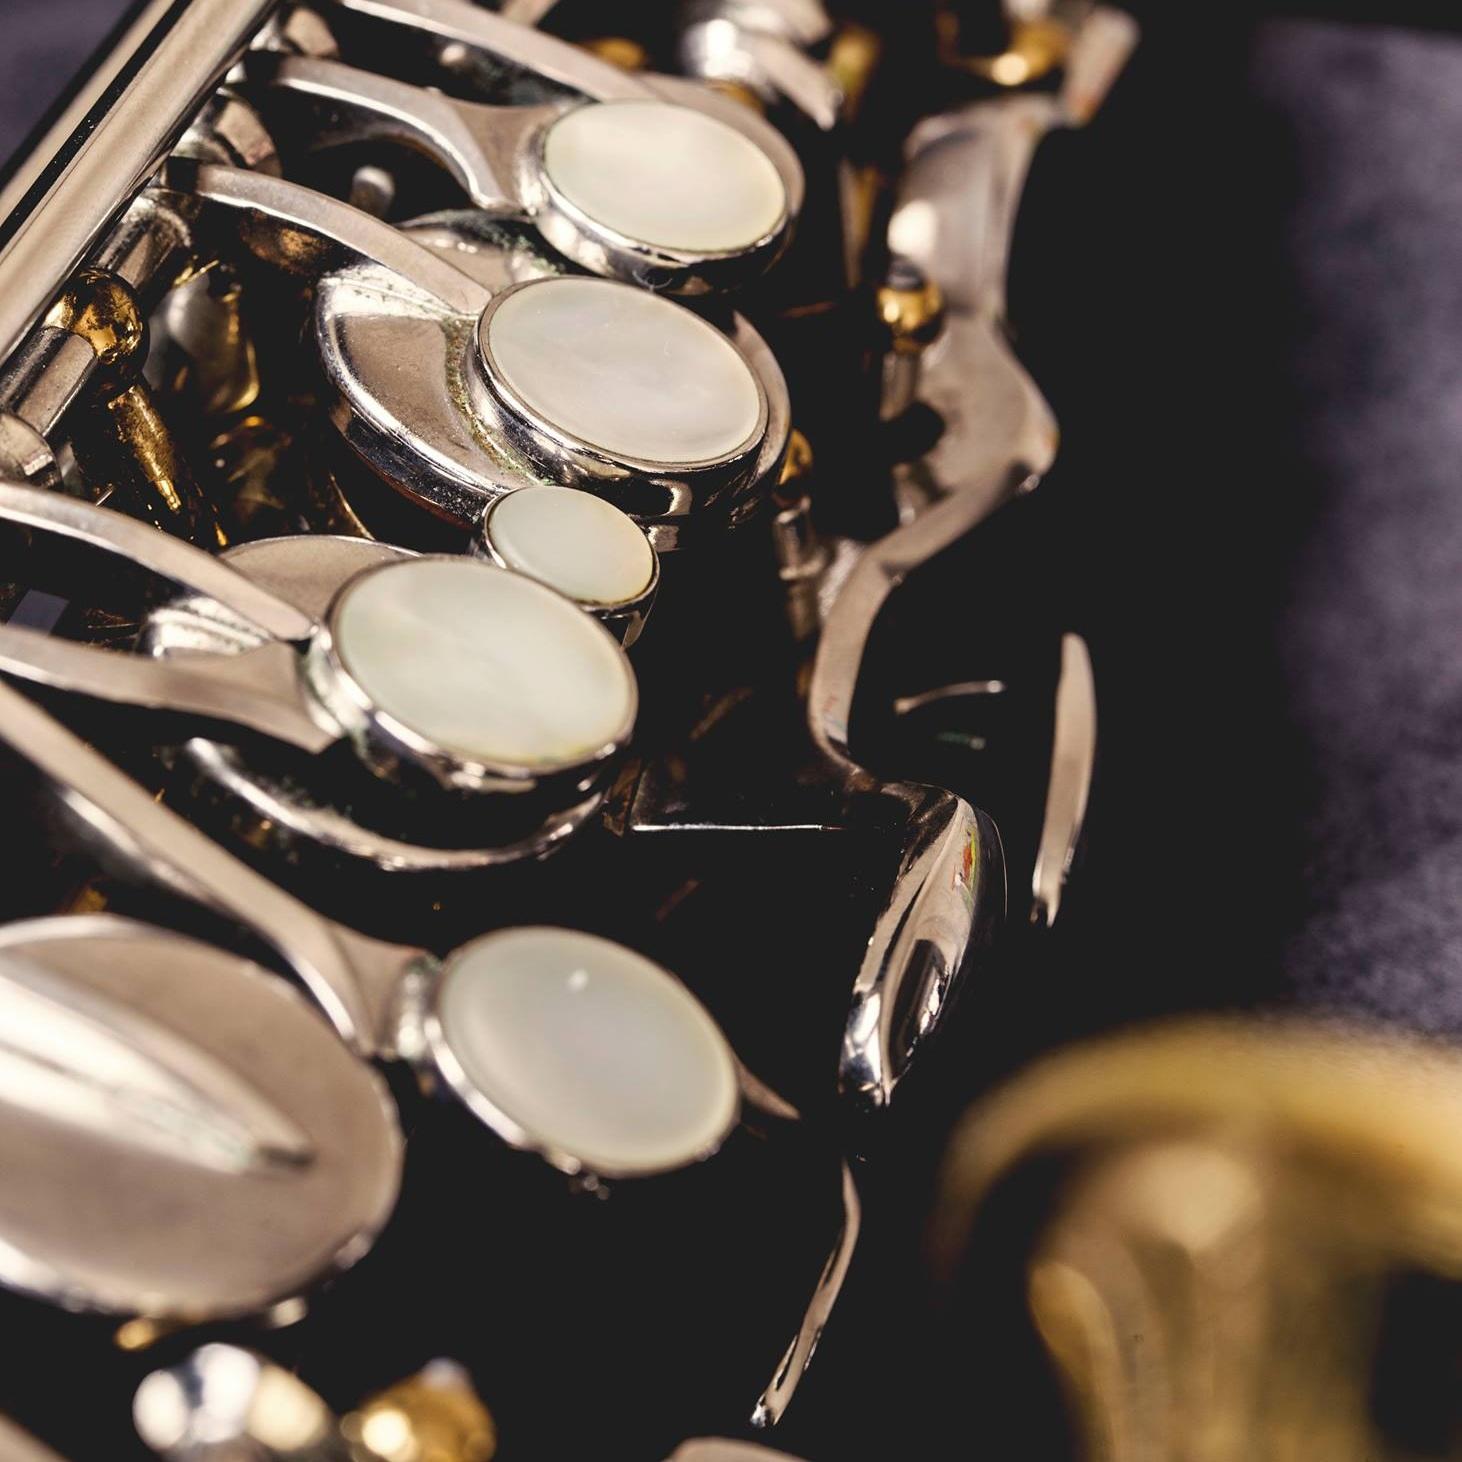 David | Saxophone, Flute, Clarinet, & Piano